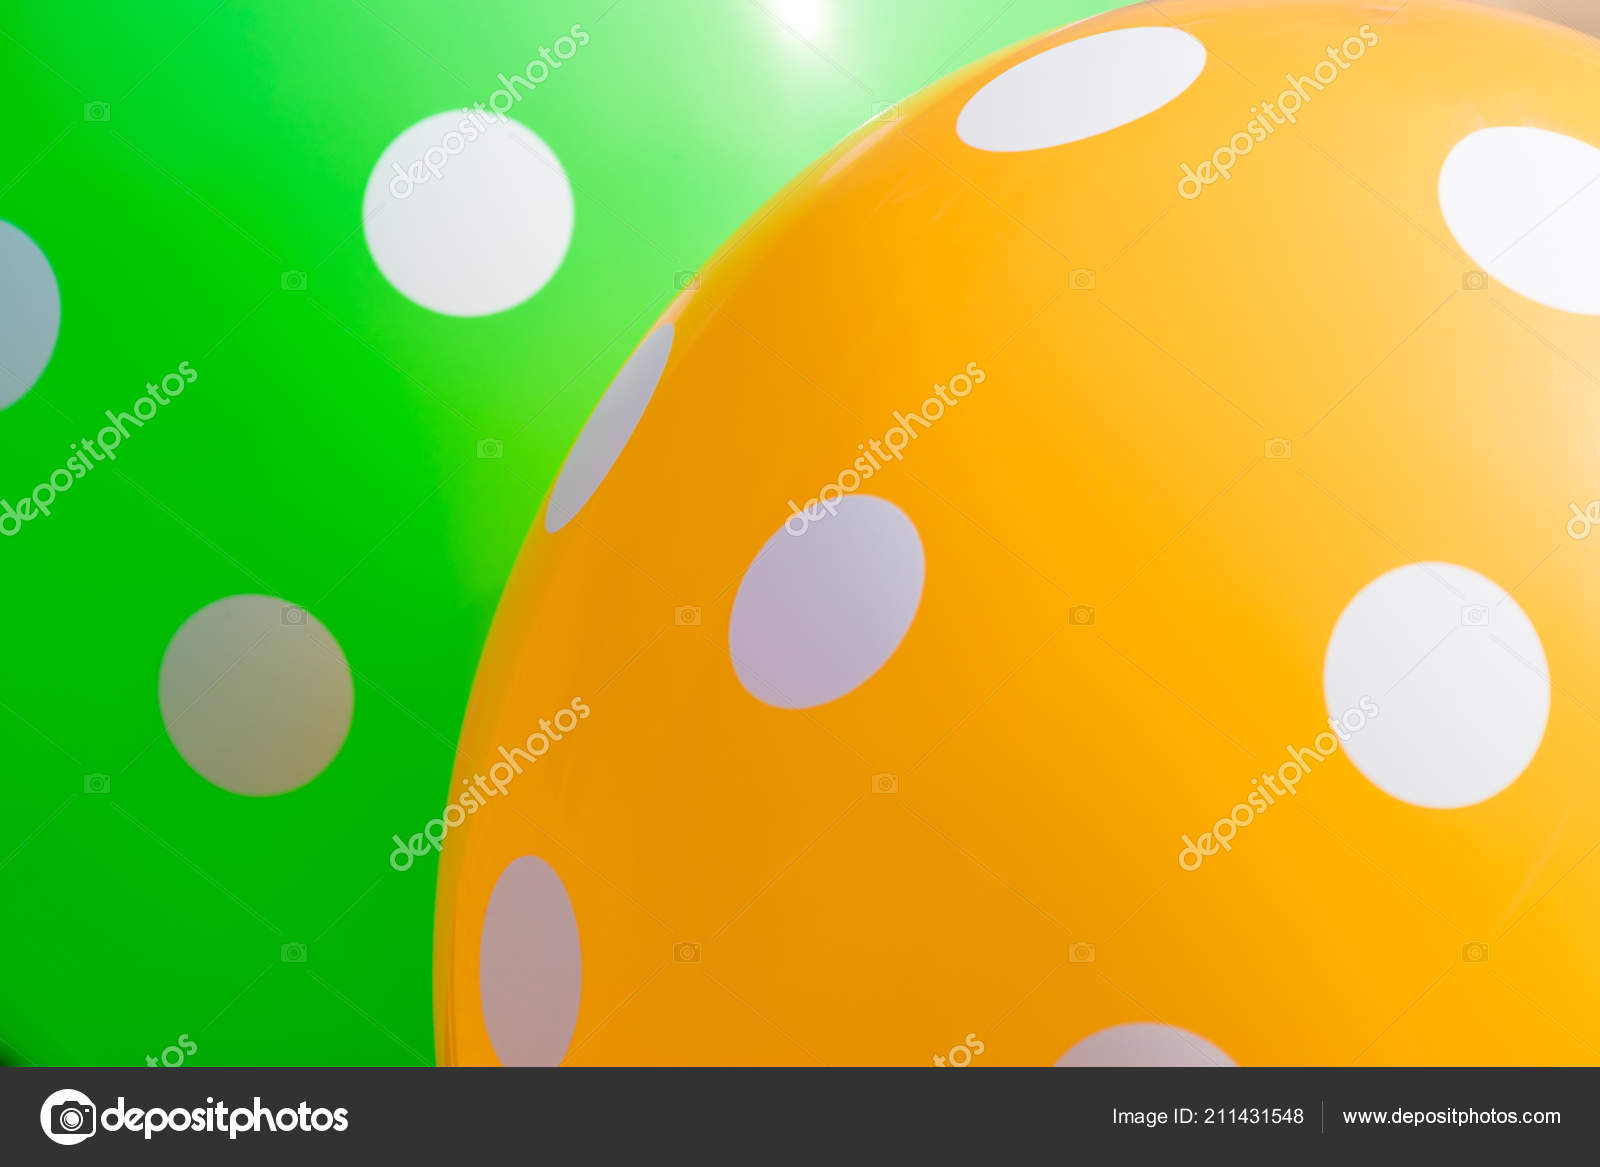 Background Green Orange Balloons White Circles Them Optimistic